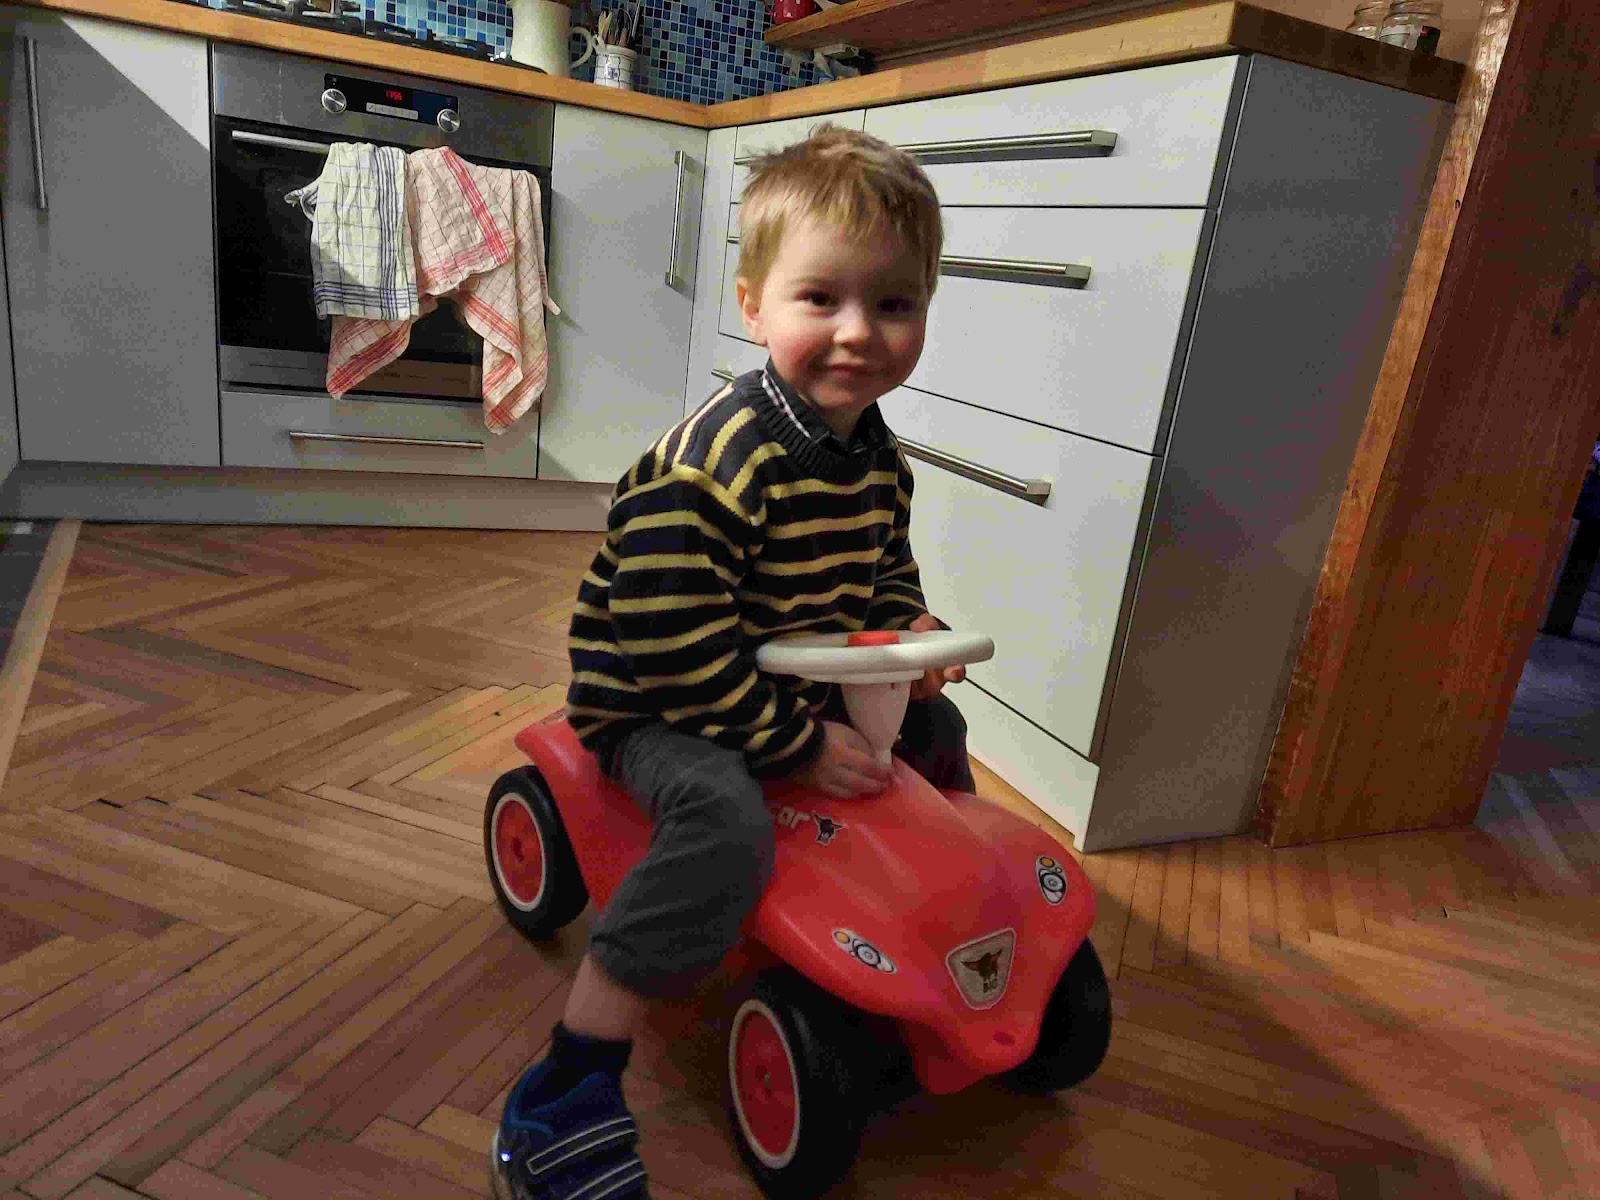 Recenze Pompo.cz: Bobby Big Car červené odrážedlo